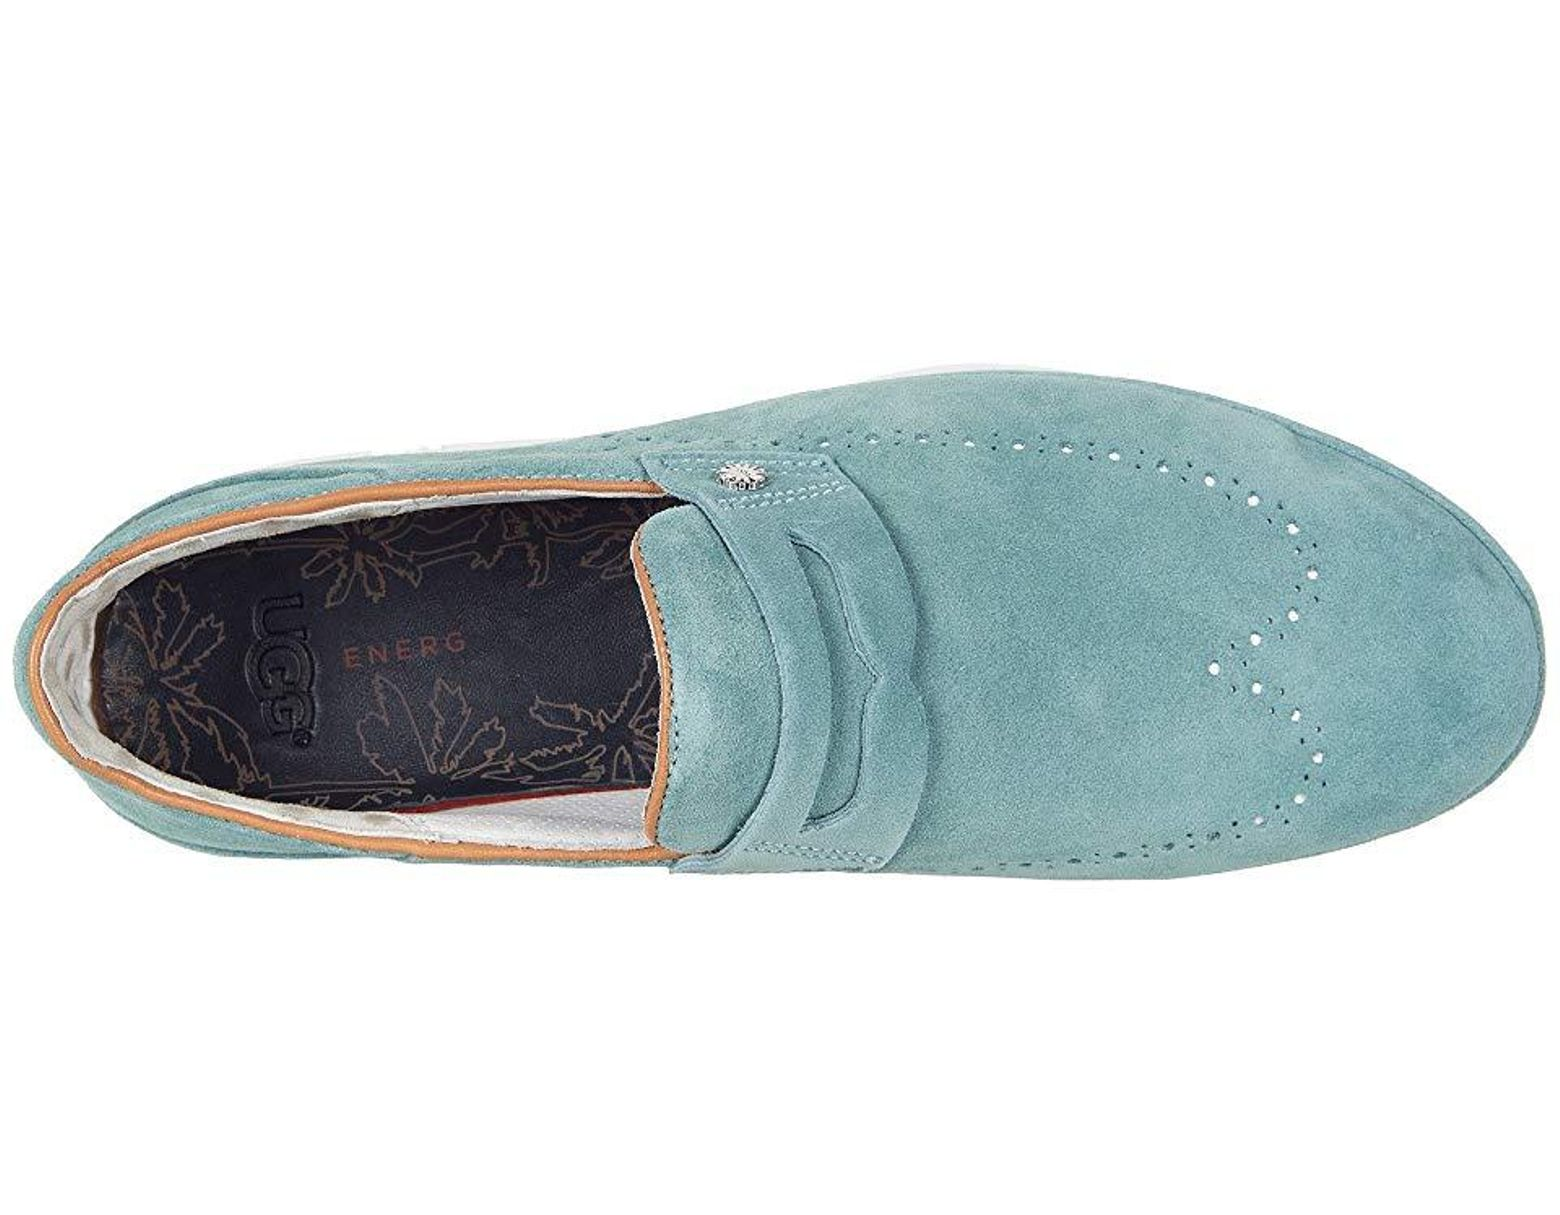 ecfe5dea1ea UGG Cali Penny Slip-on (aloe Vera) Shoes in Green for Men - Lyst